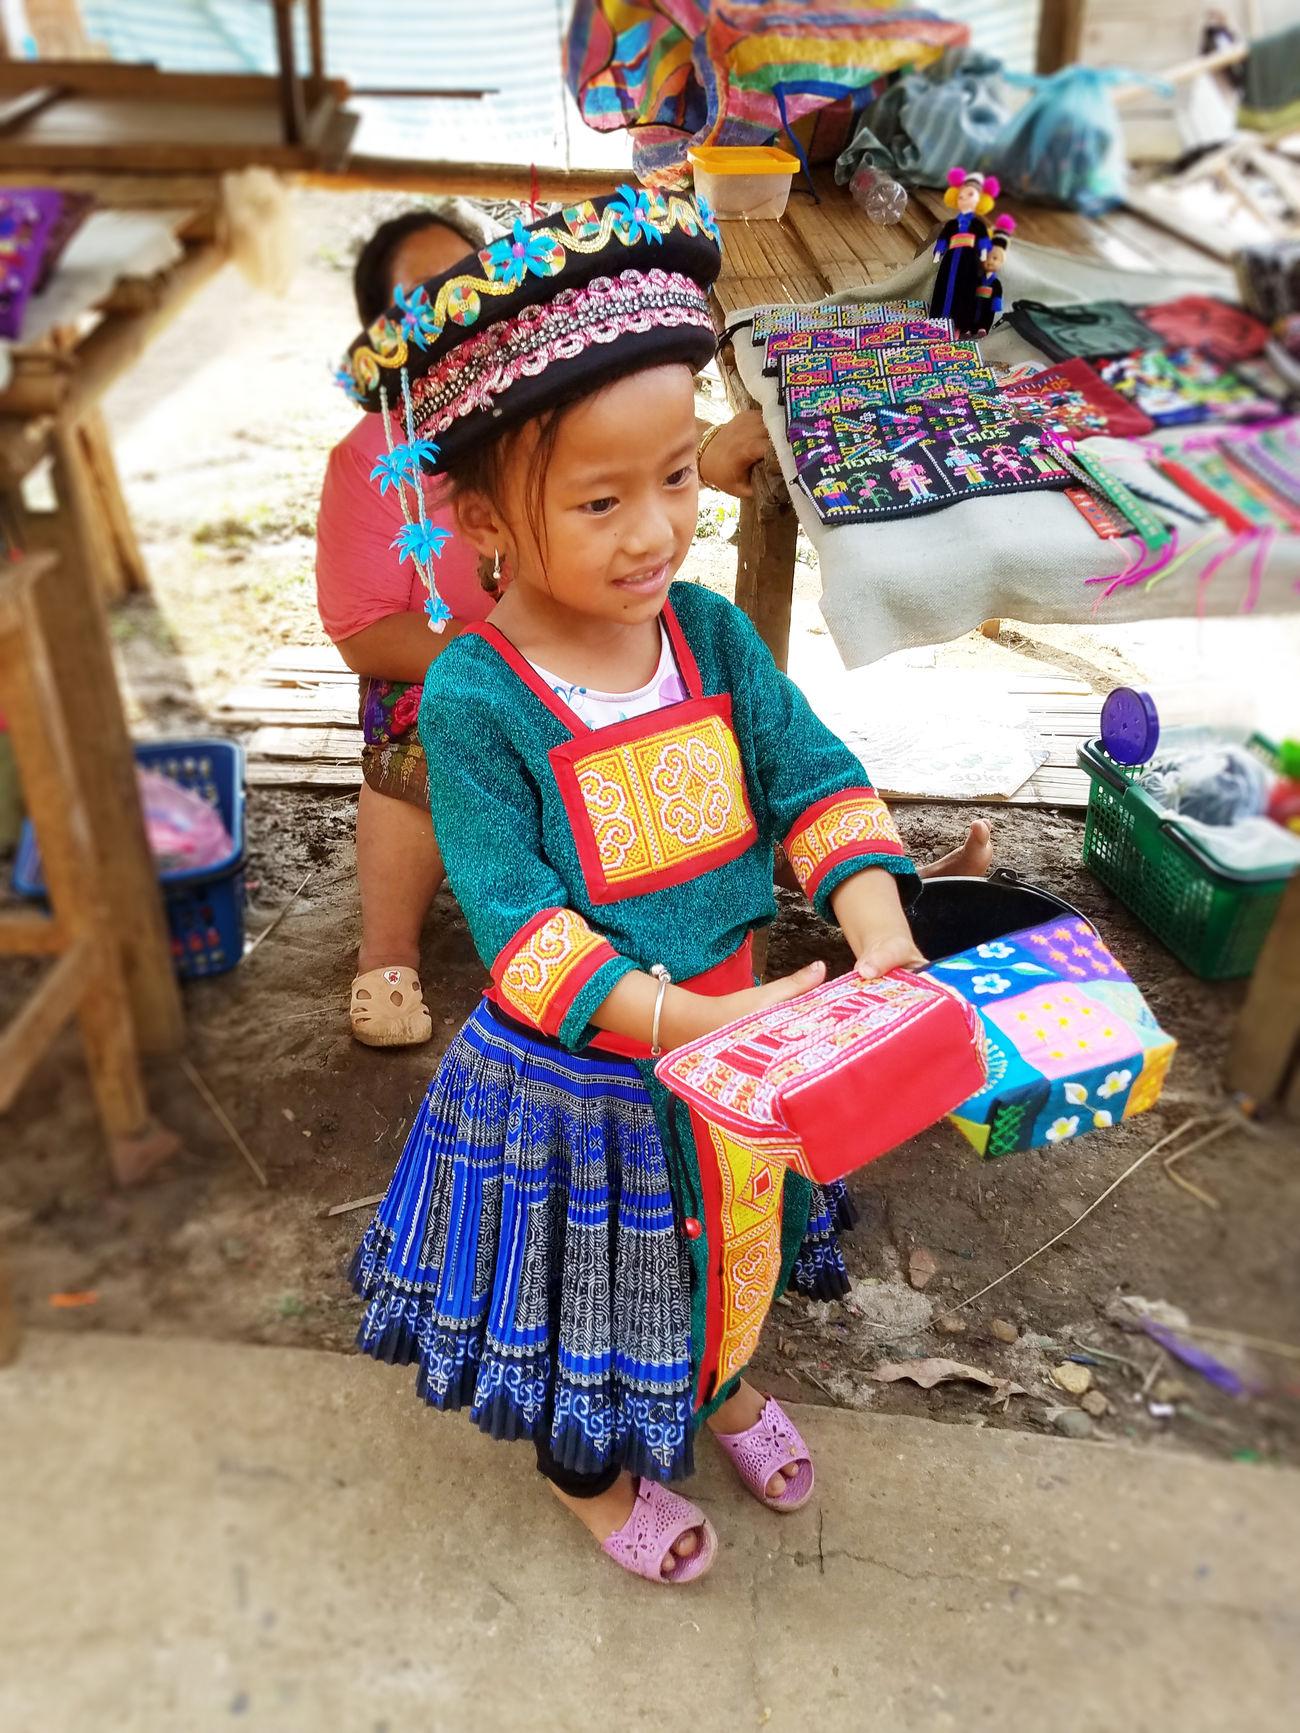 2017 ASIA Childhood Colorful Culture Cute Day Girls Laos Luang Phabang Luang Prabang Mon National Costume Outdoors People Real People Seller Shop Shopping モン族 ラオス ルアンパバーン